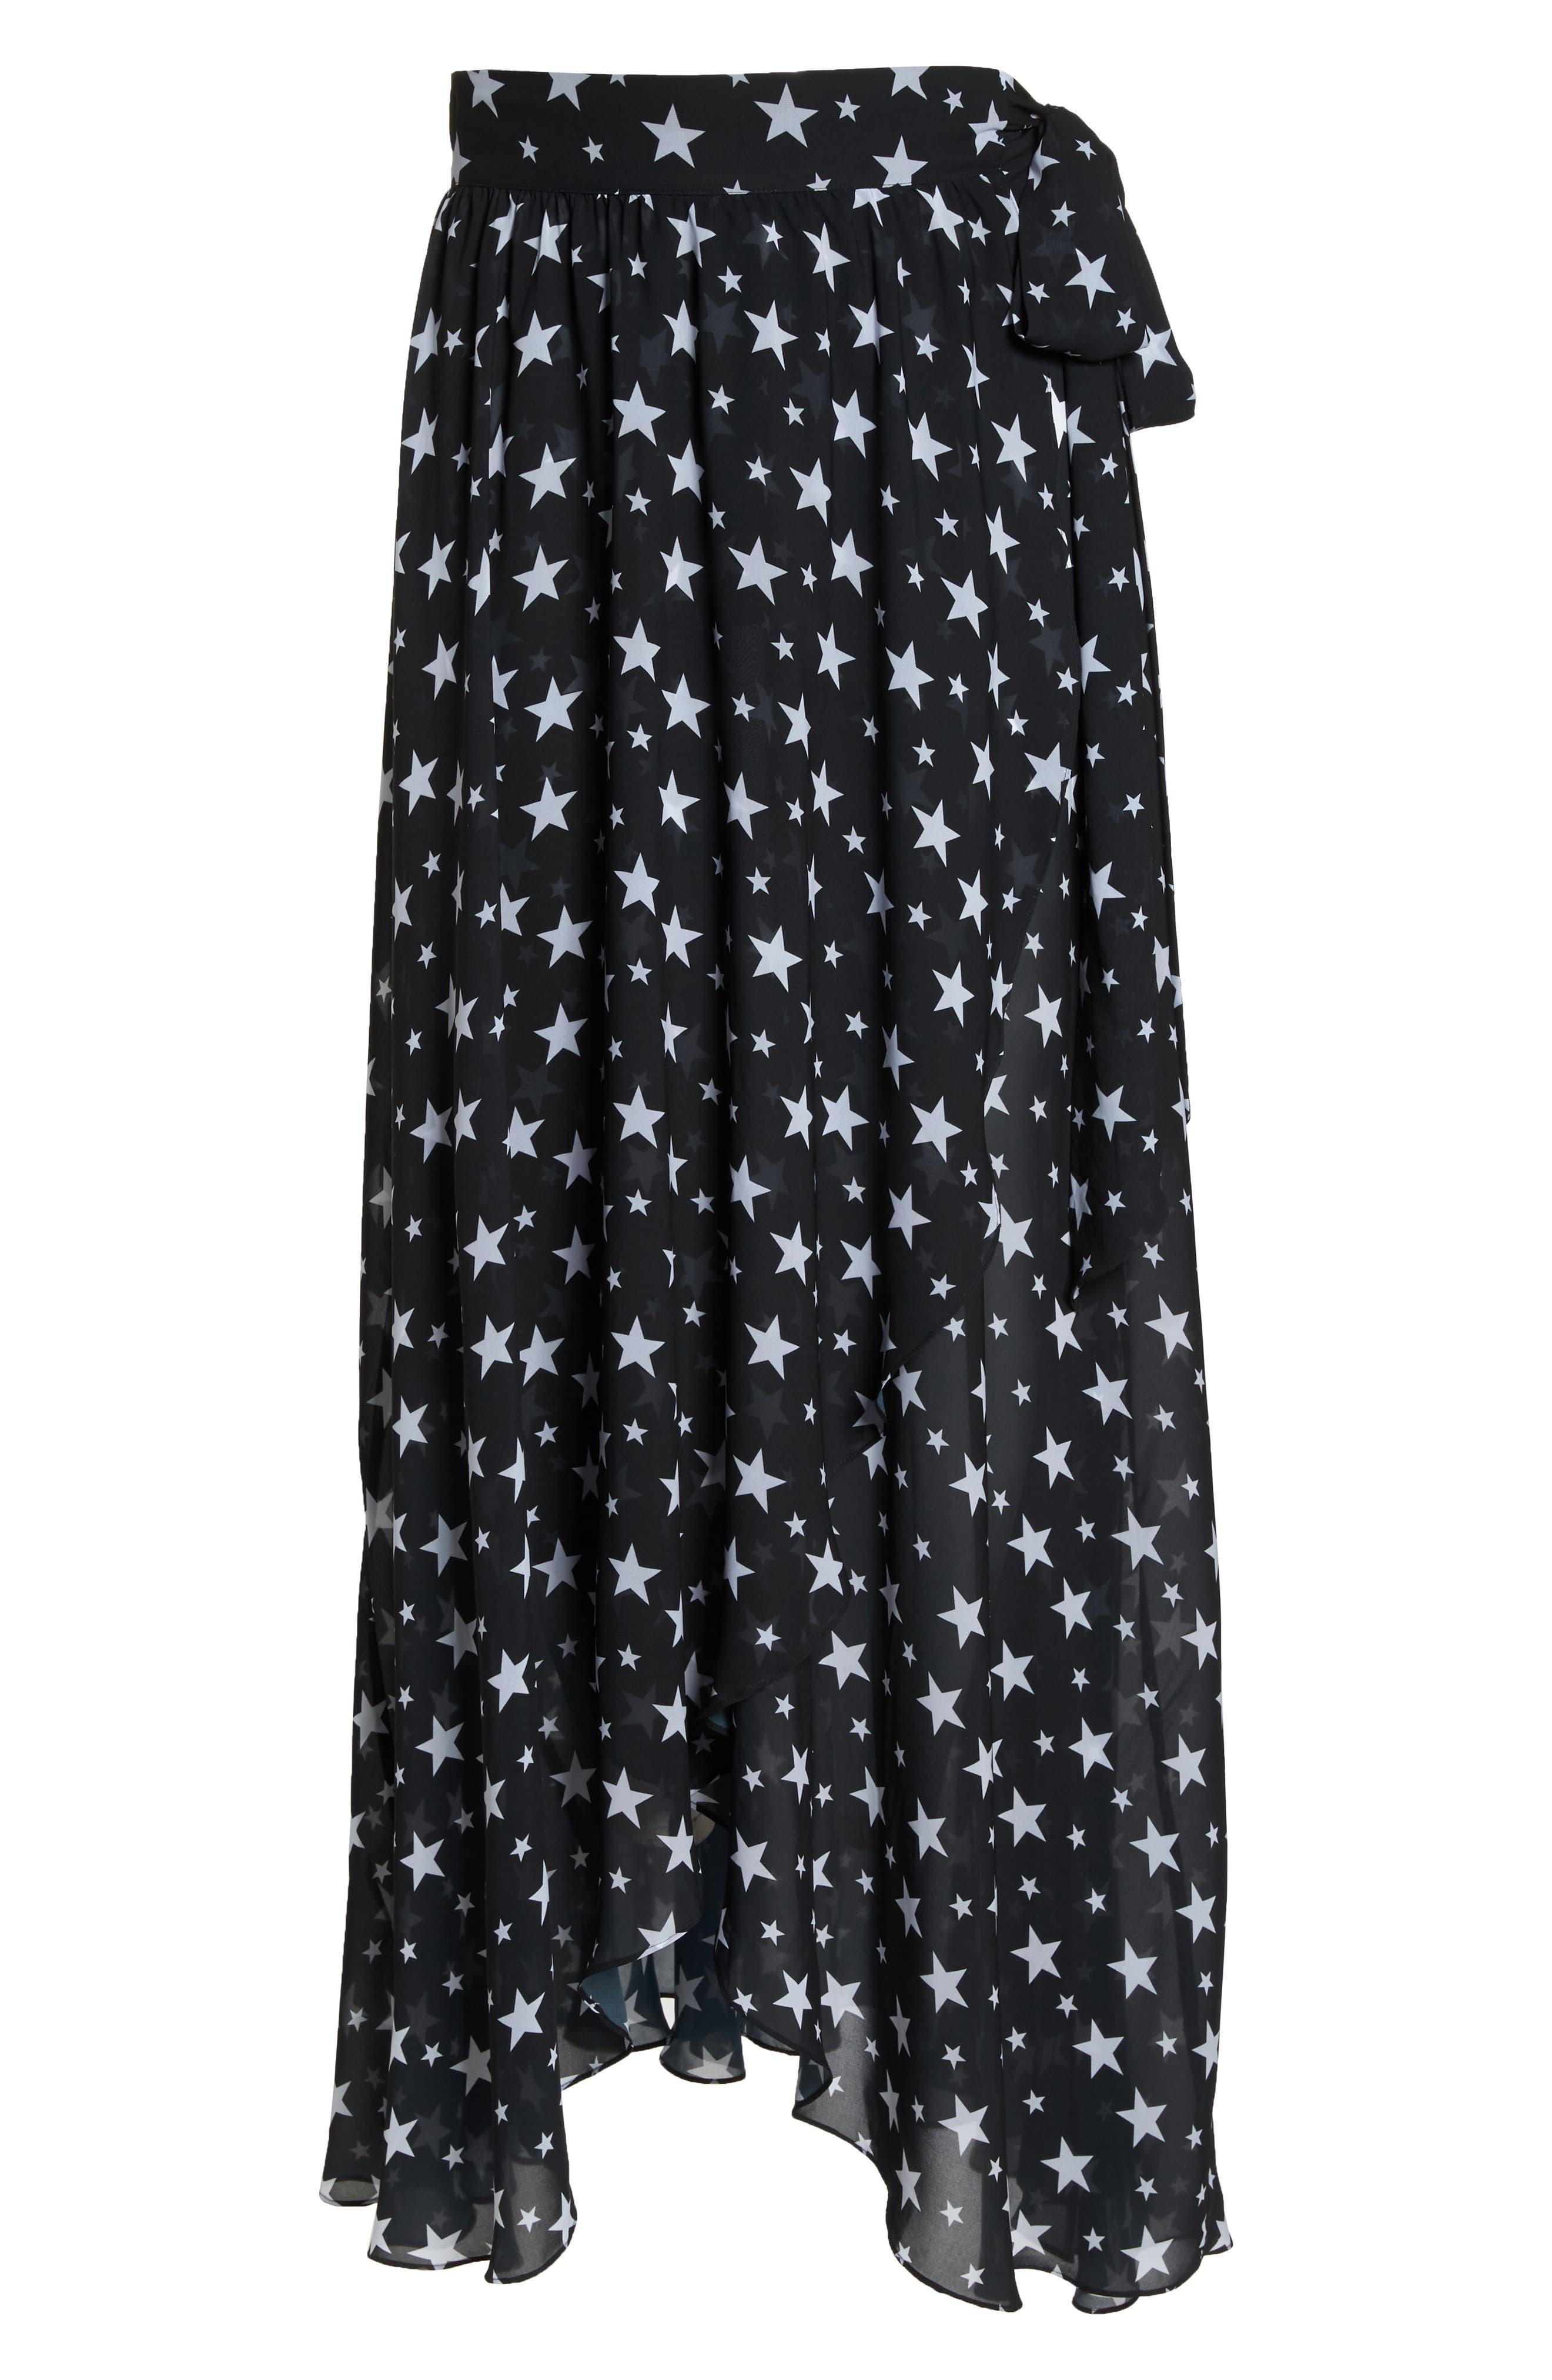 Cannes Cover-Up Skirt,                             Alternate thumbnail 6, color,                             Black Star